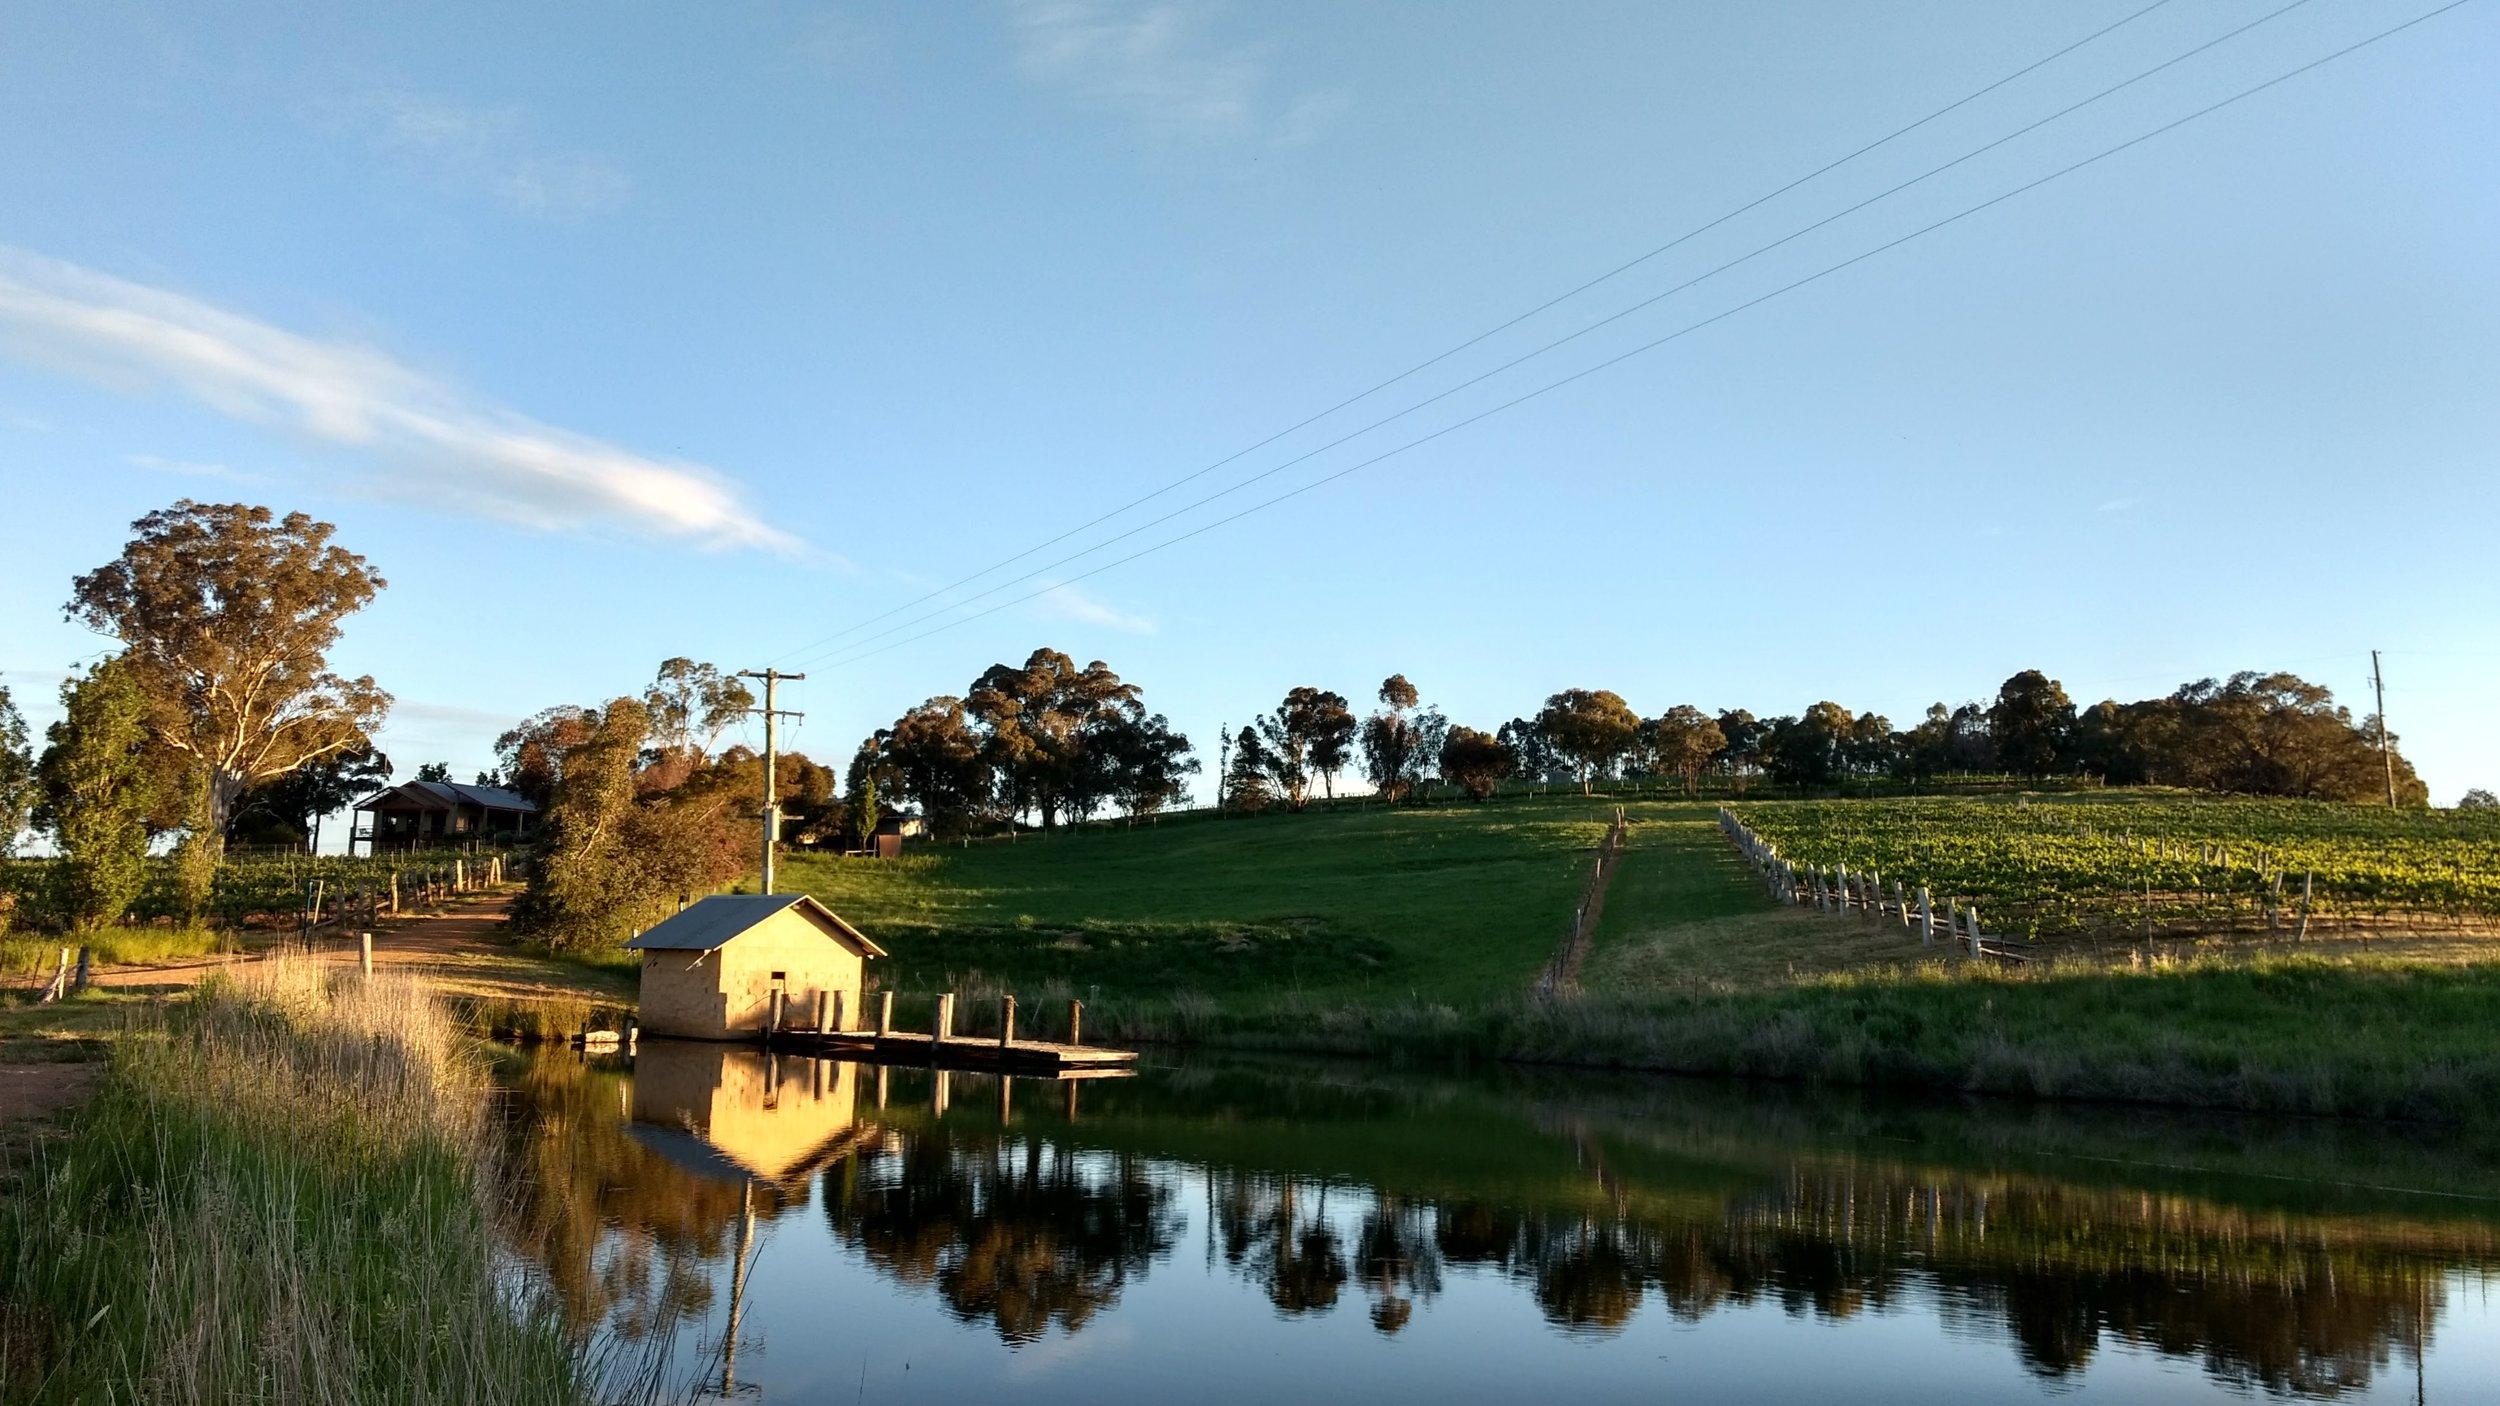 Flood rain in late Spring